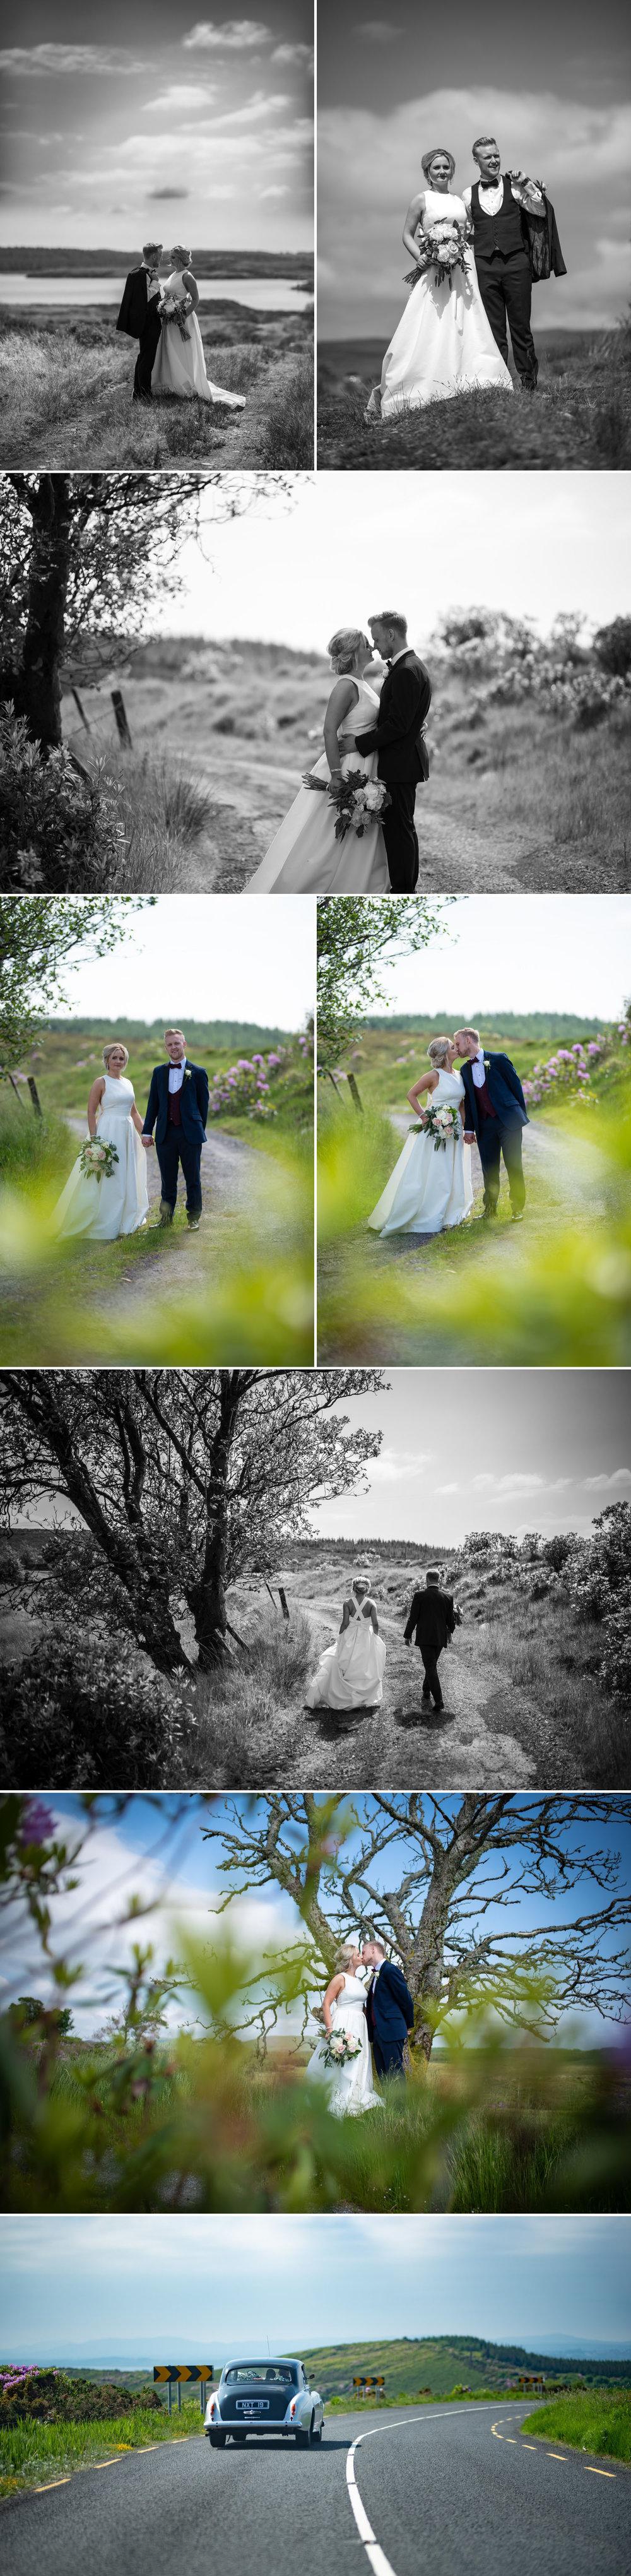 best wedding photographers northern ireland 13.jpg